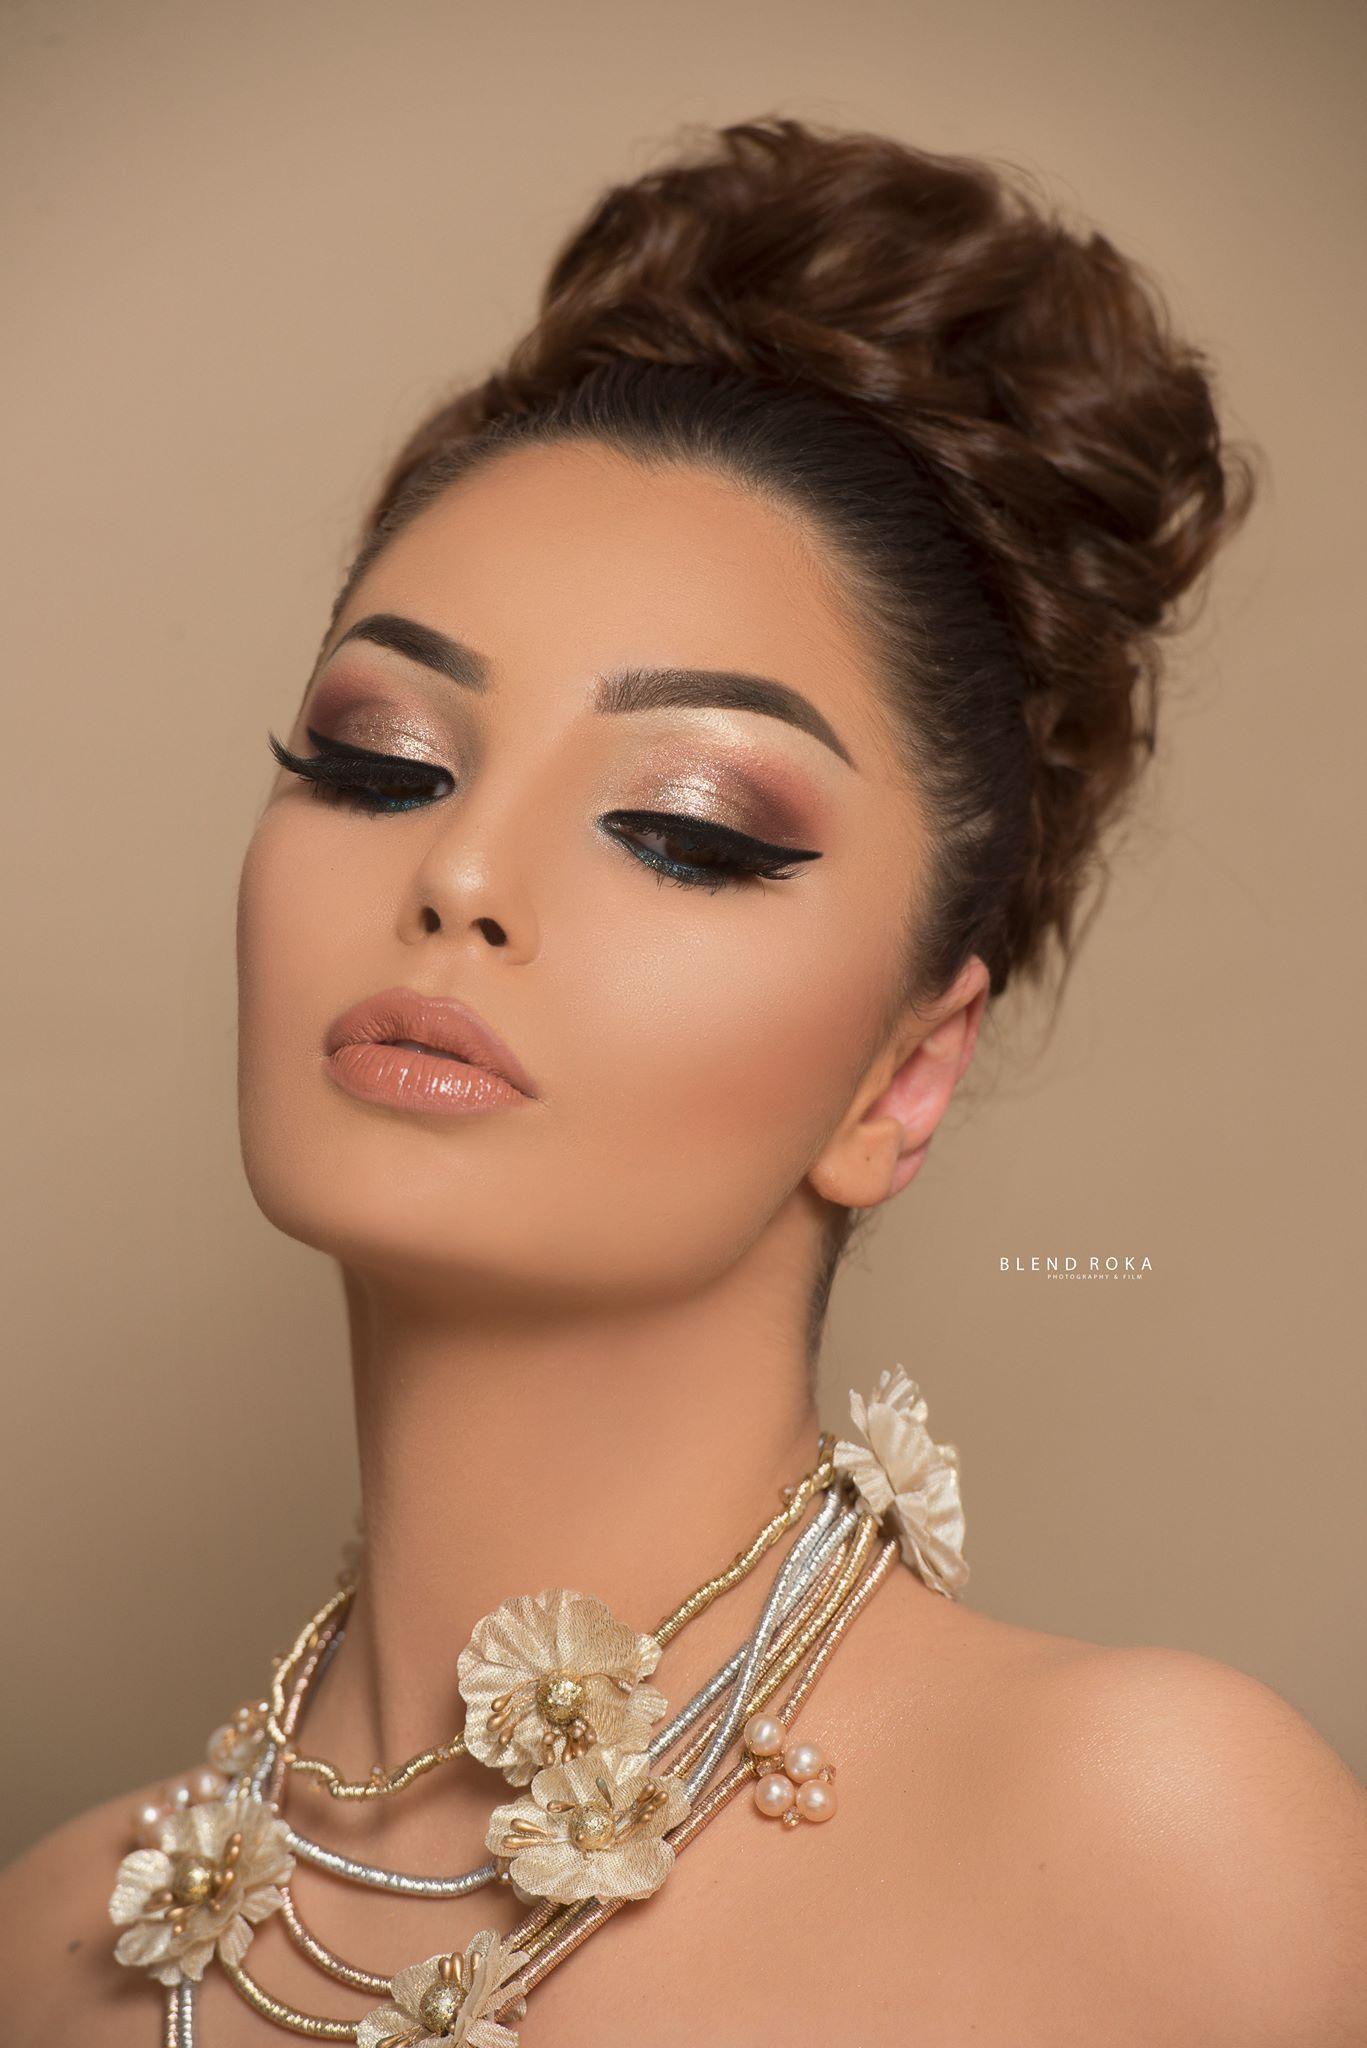 Pin by Marisela Hernandez on Makeup looks Beauty makeup